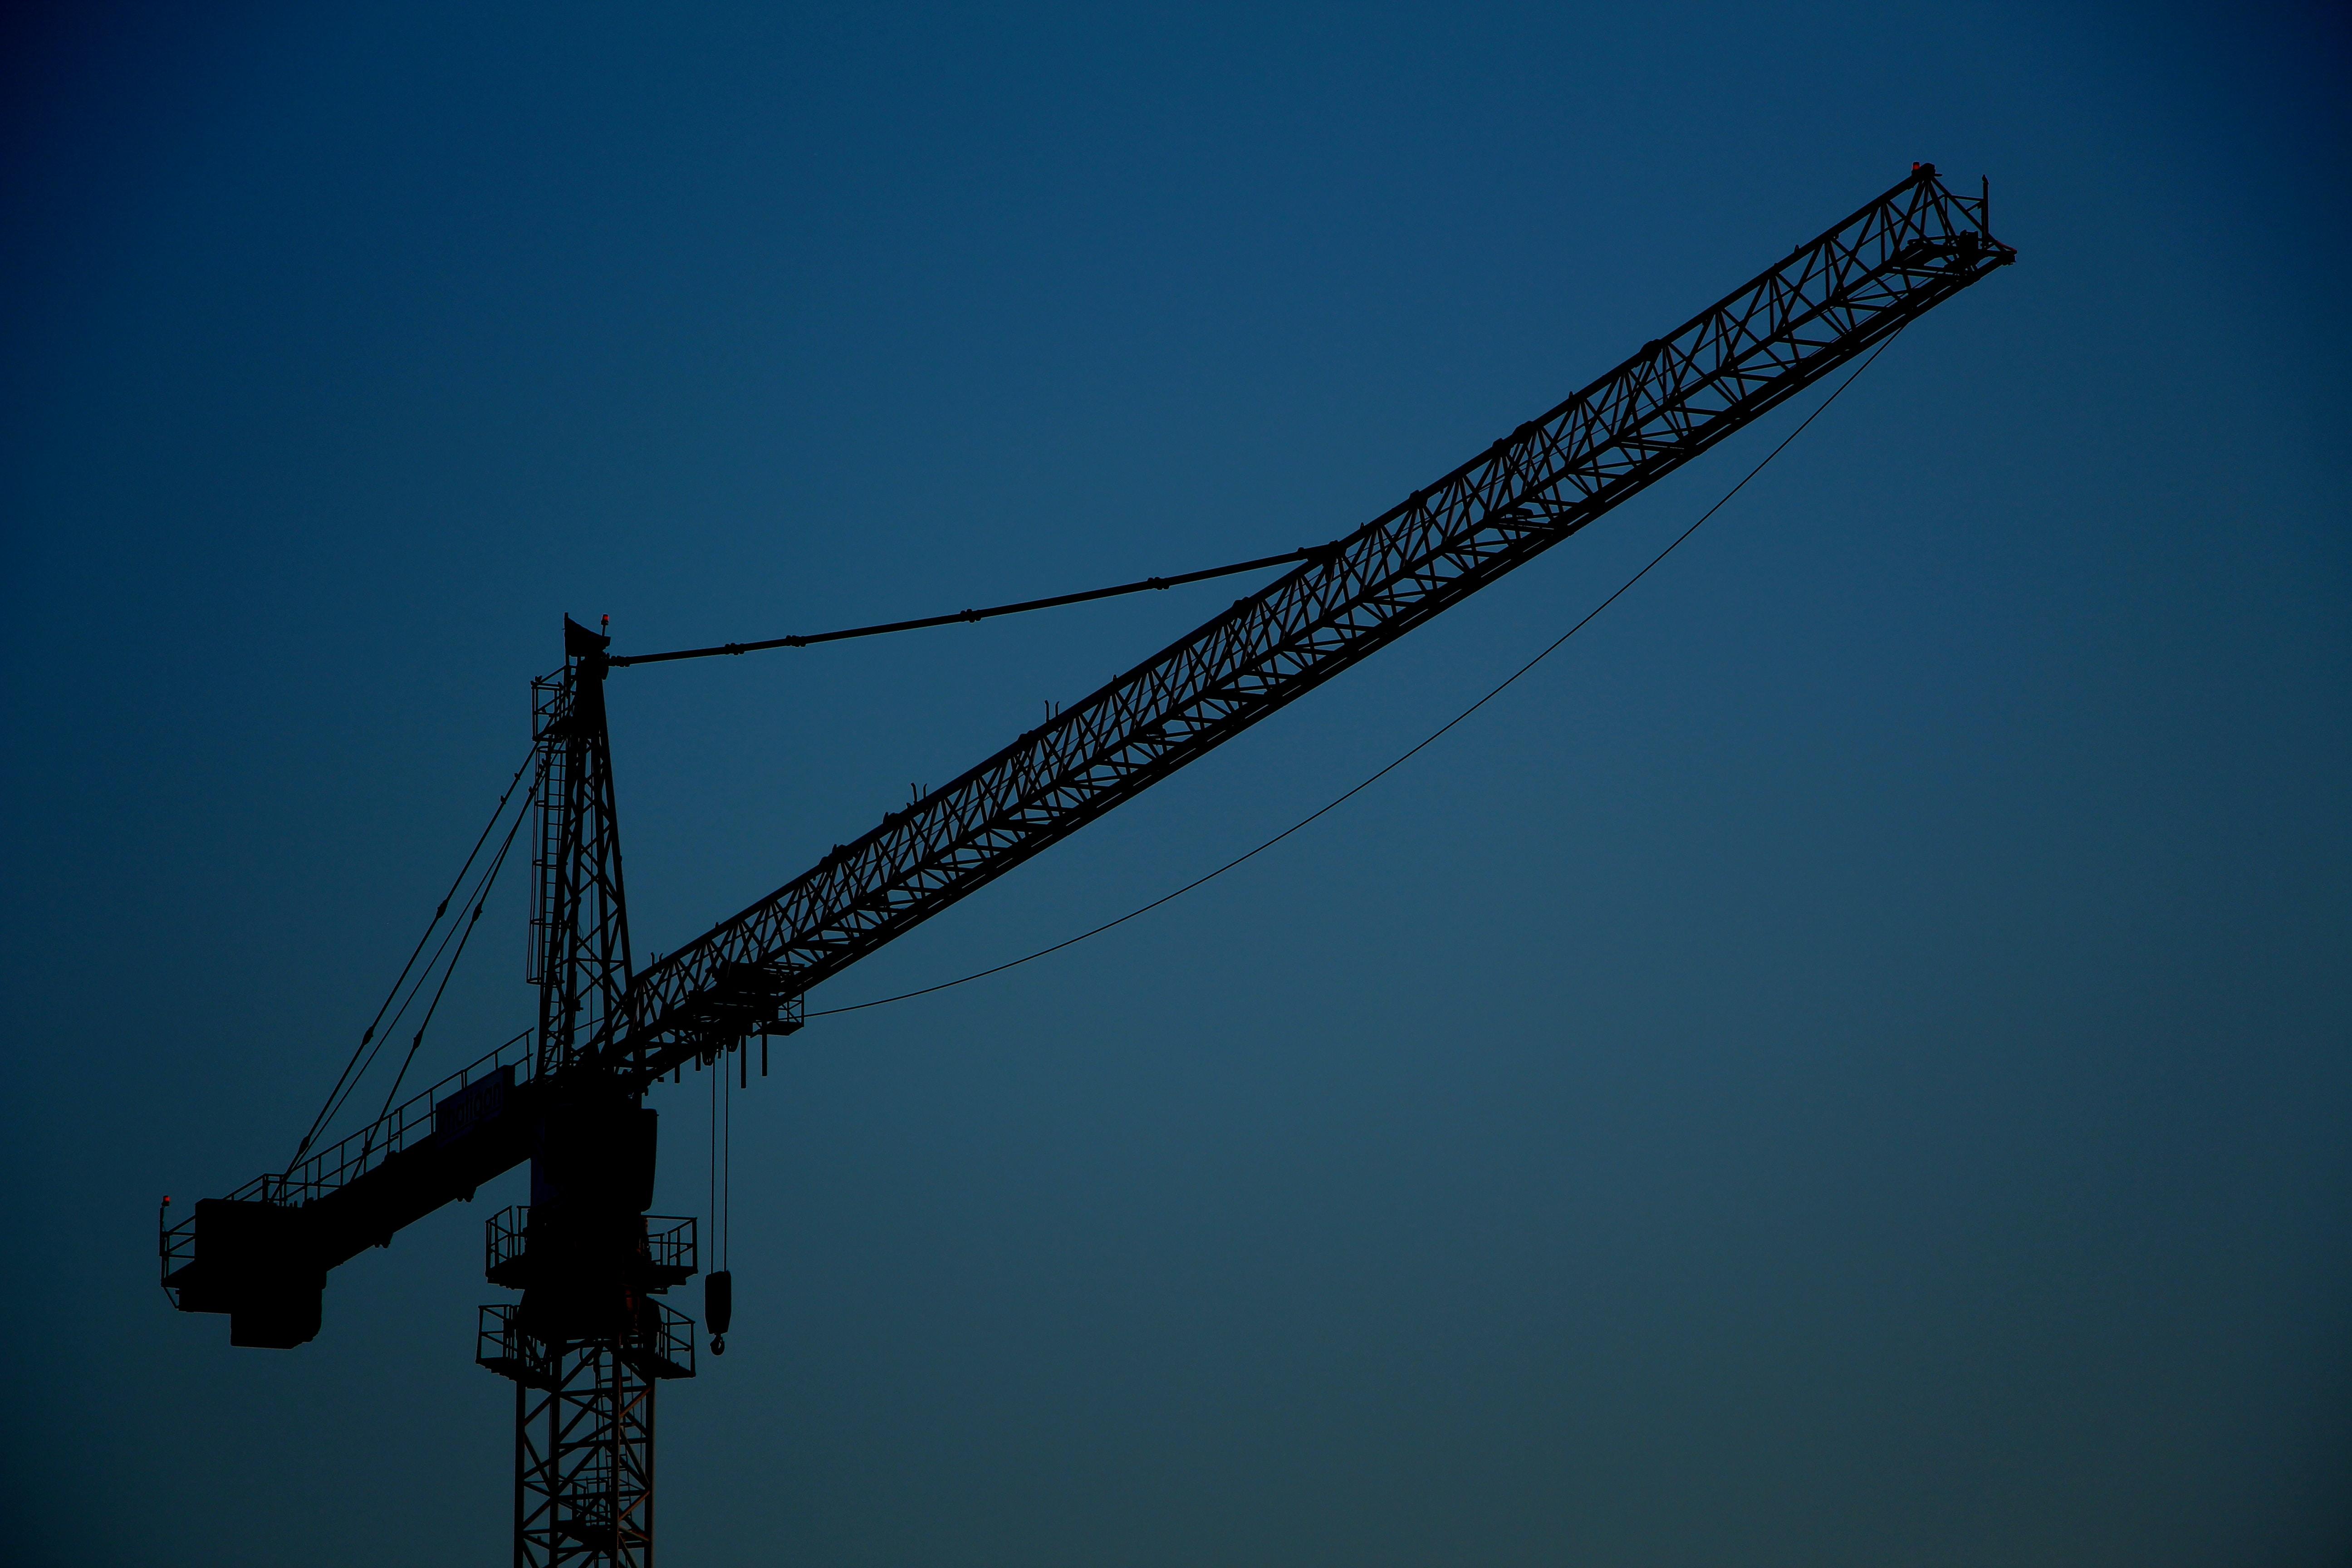 black metal crane tower under blue sky